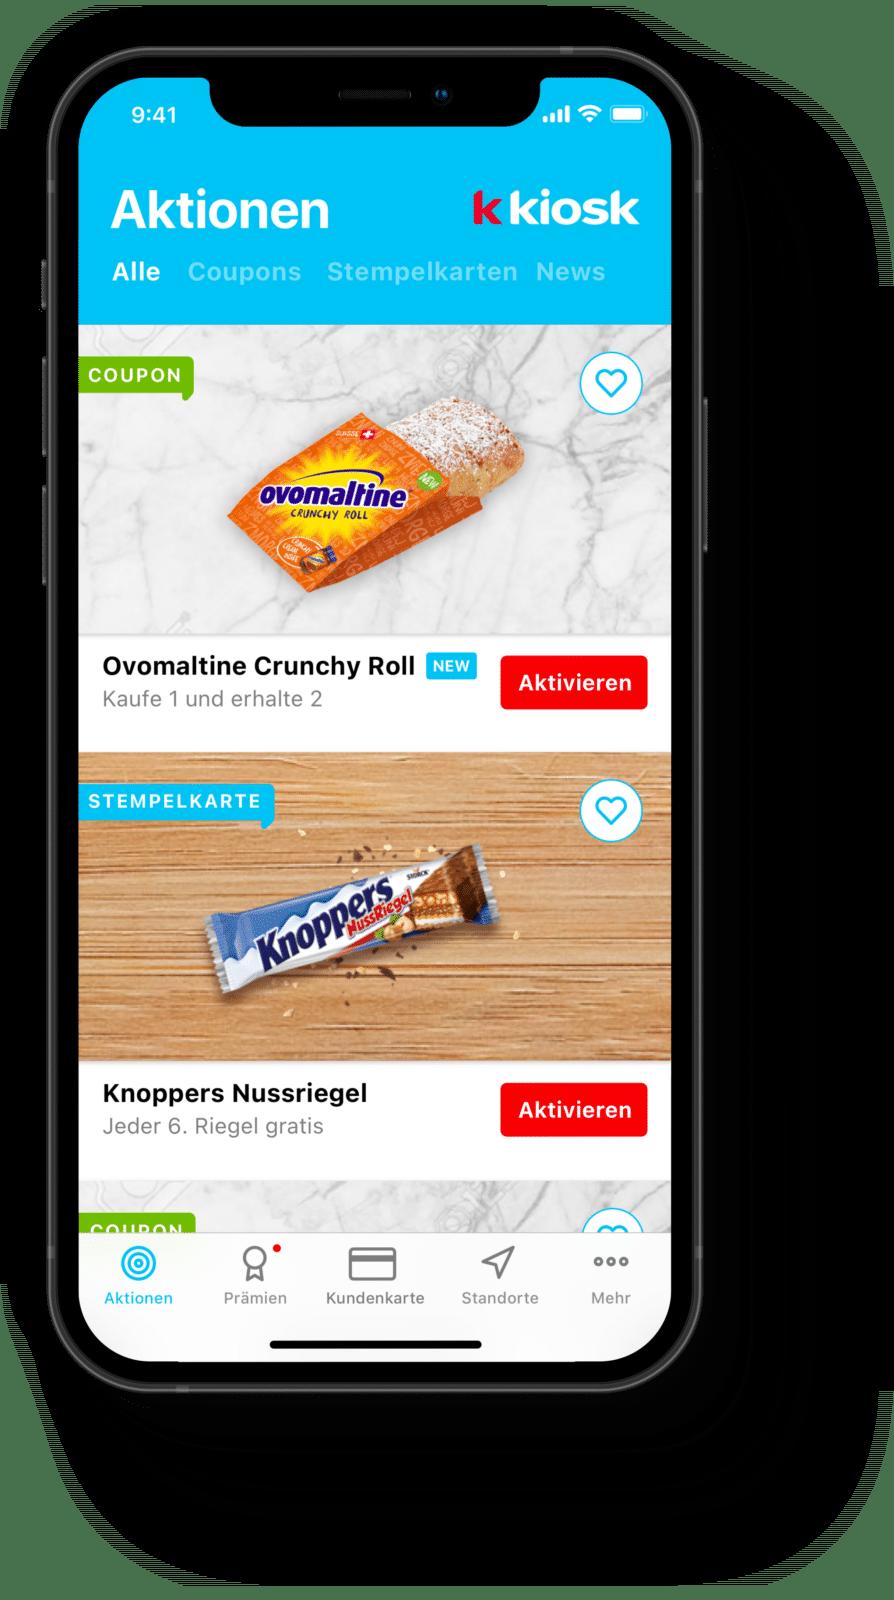 k kiosk App